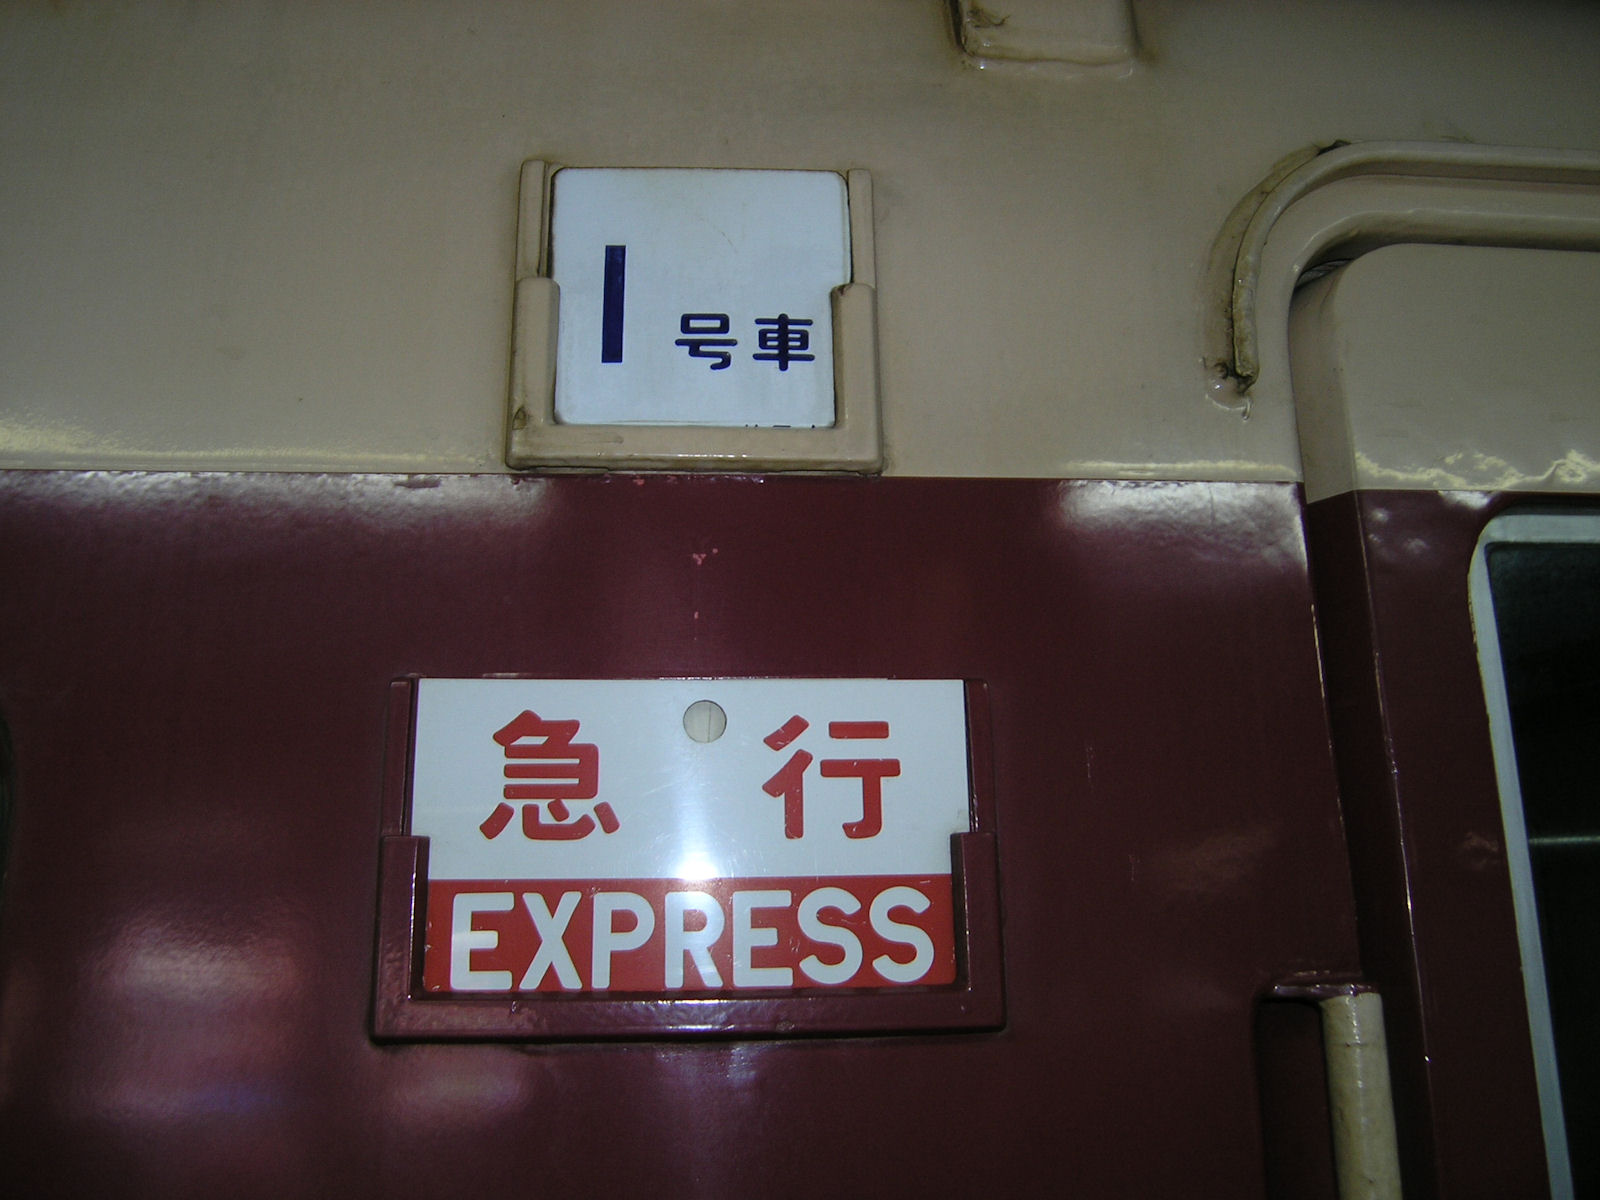 急行能登号急行のサボ(JPG-213k)